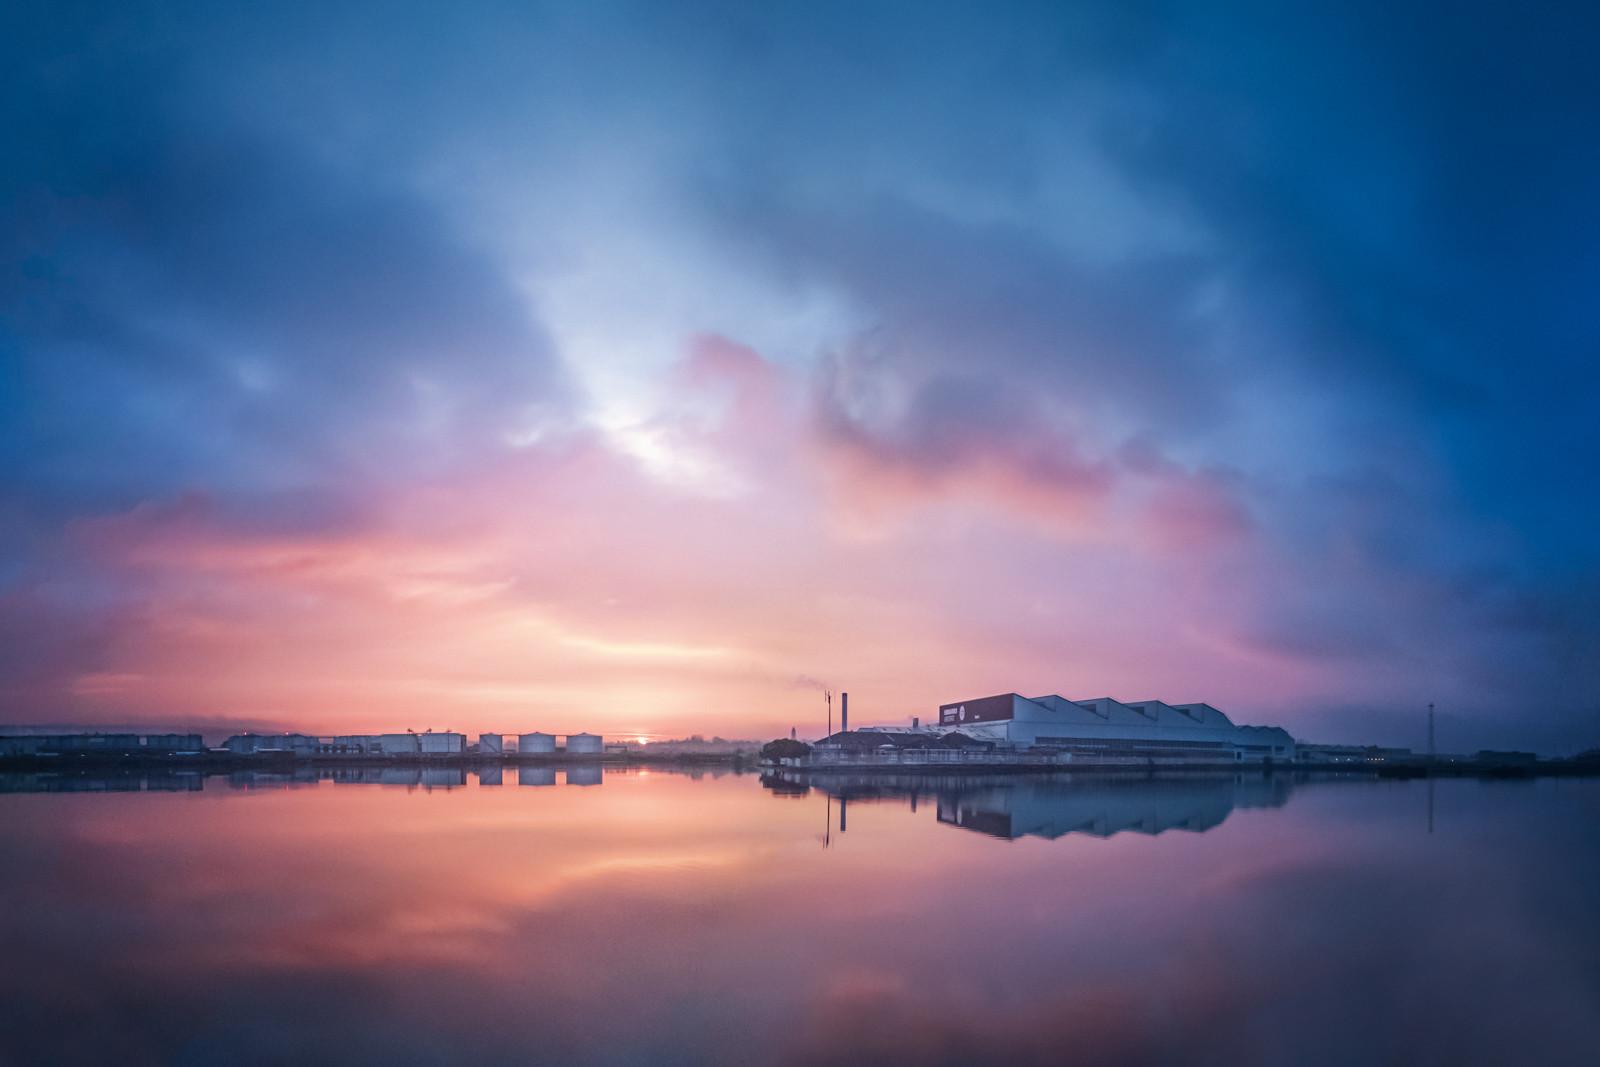 PDI - A Still Morning  by Eddie Spence  (9 marks)